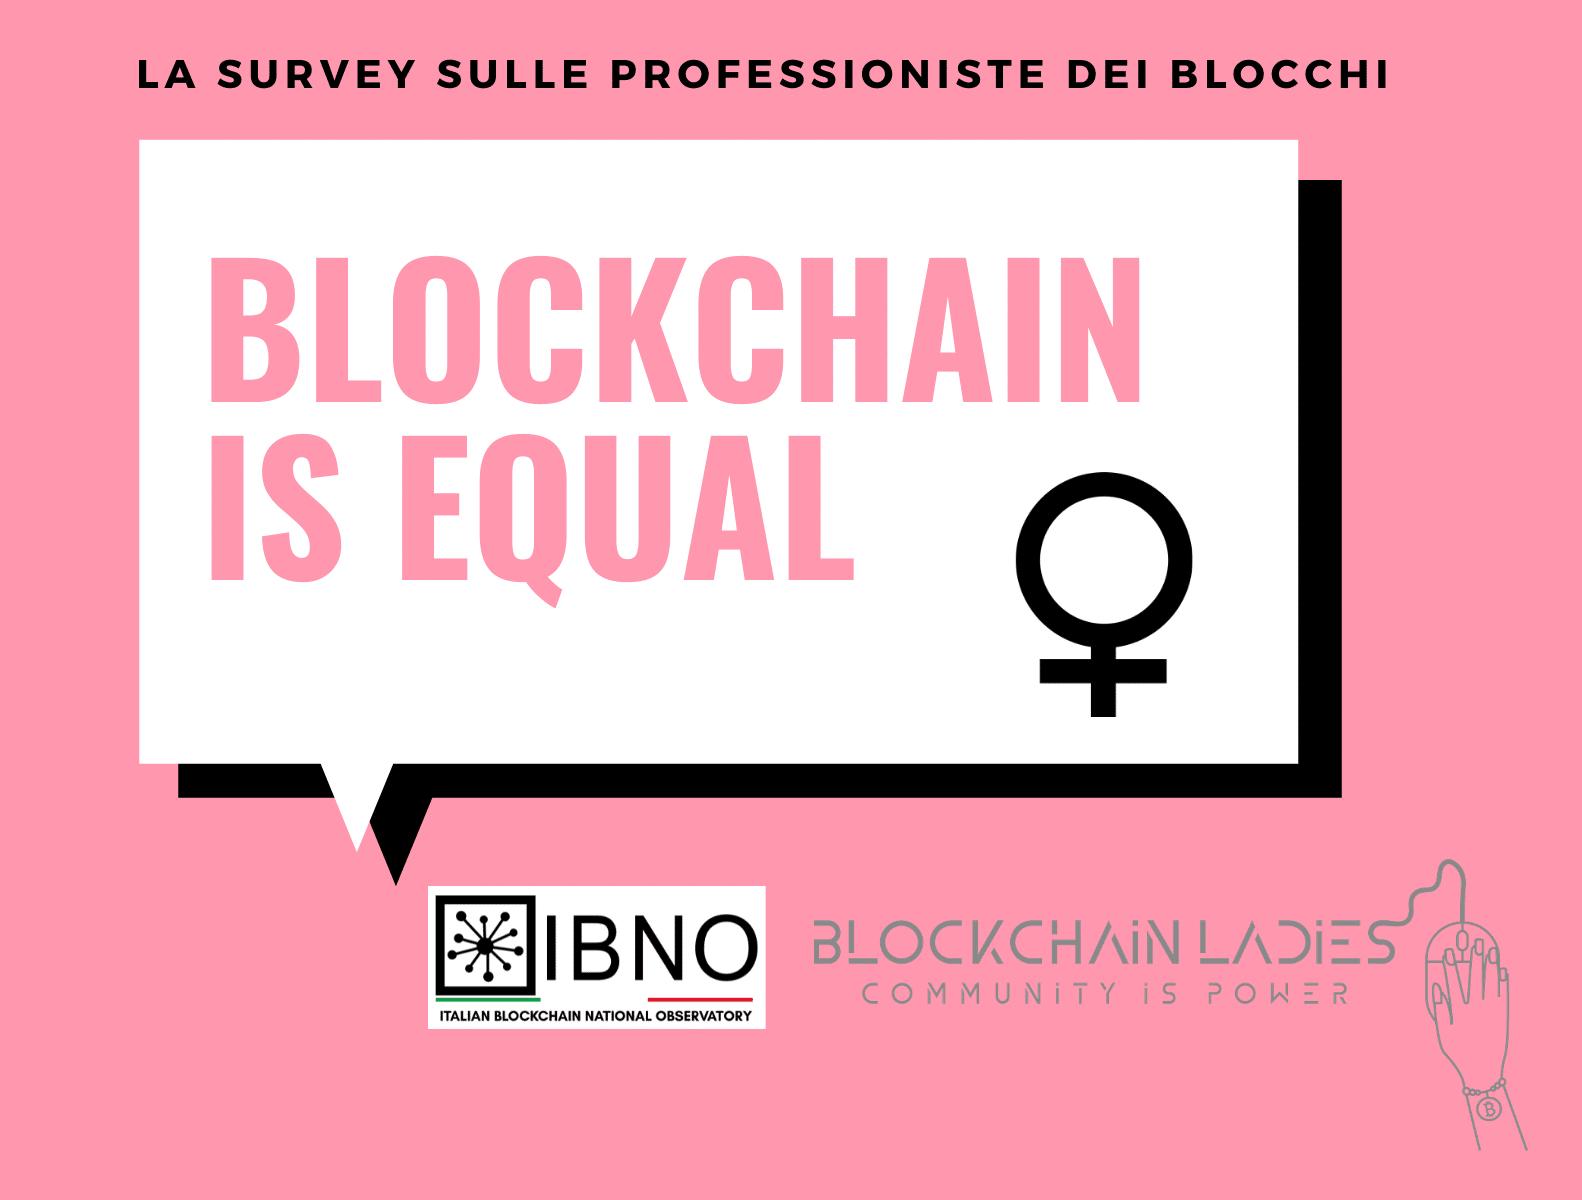 IBNO and Blockchain Ladies announce #BlockchainIsEqual Survey to address the gender gap phenomenon